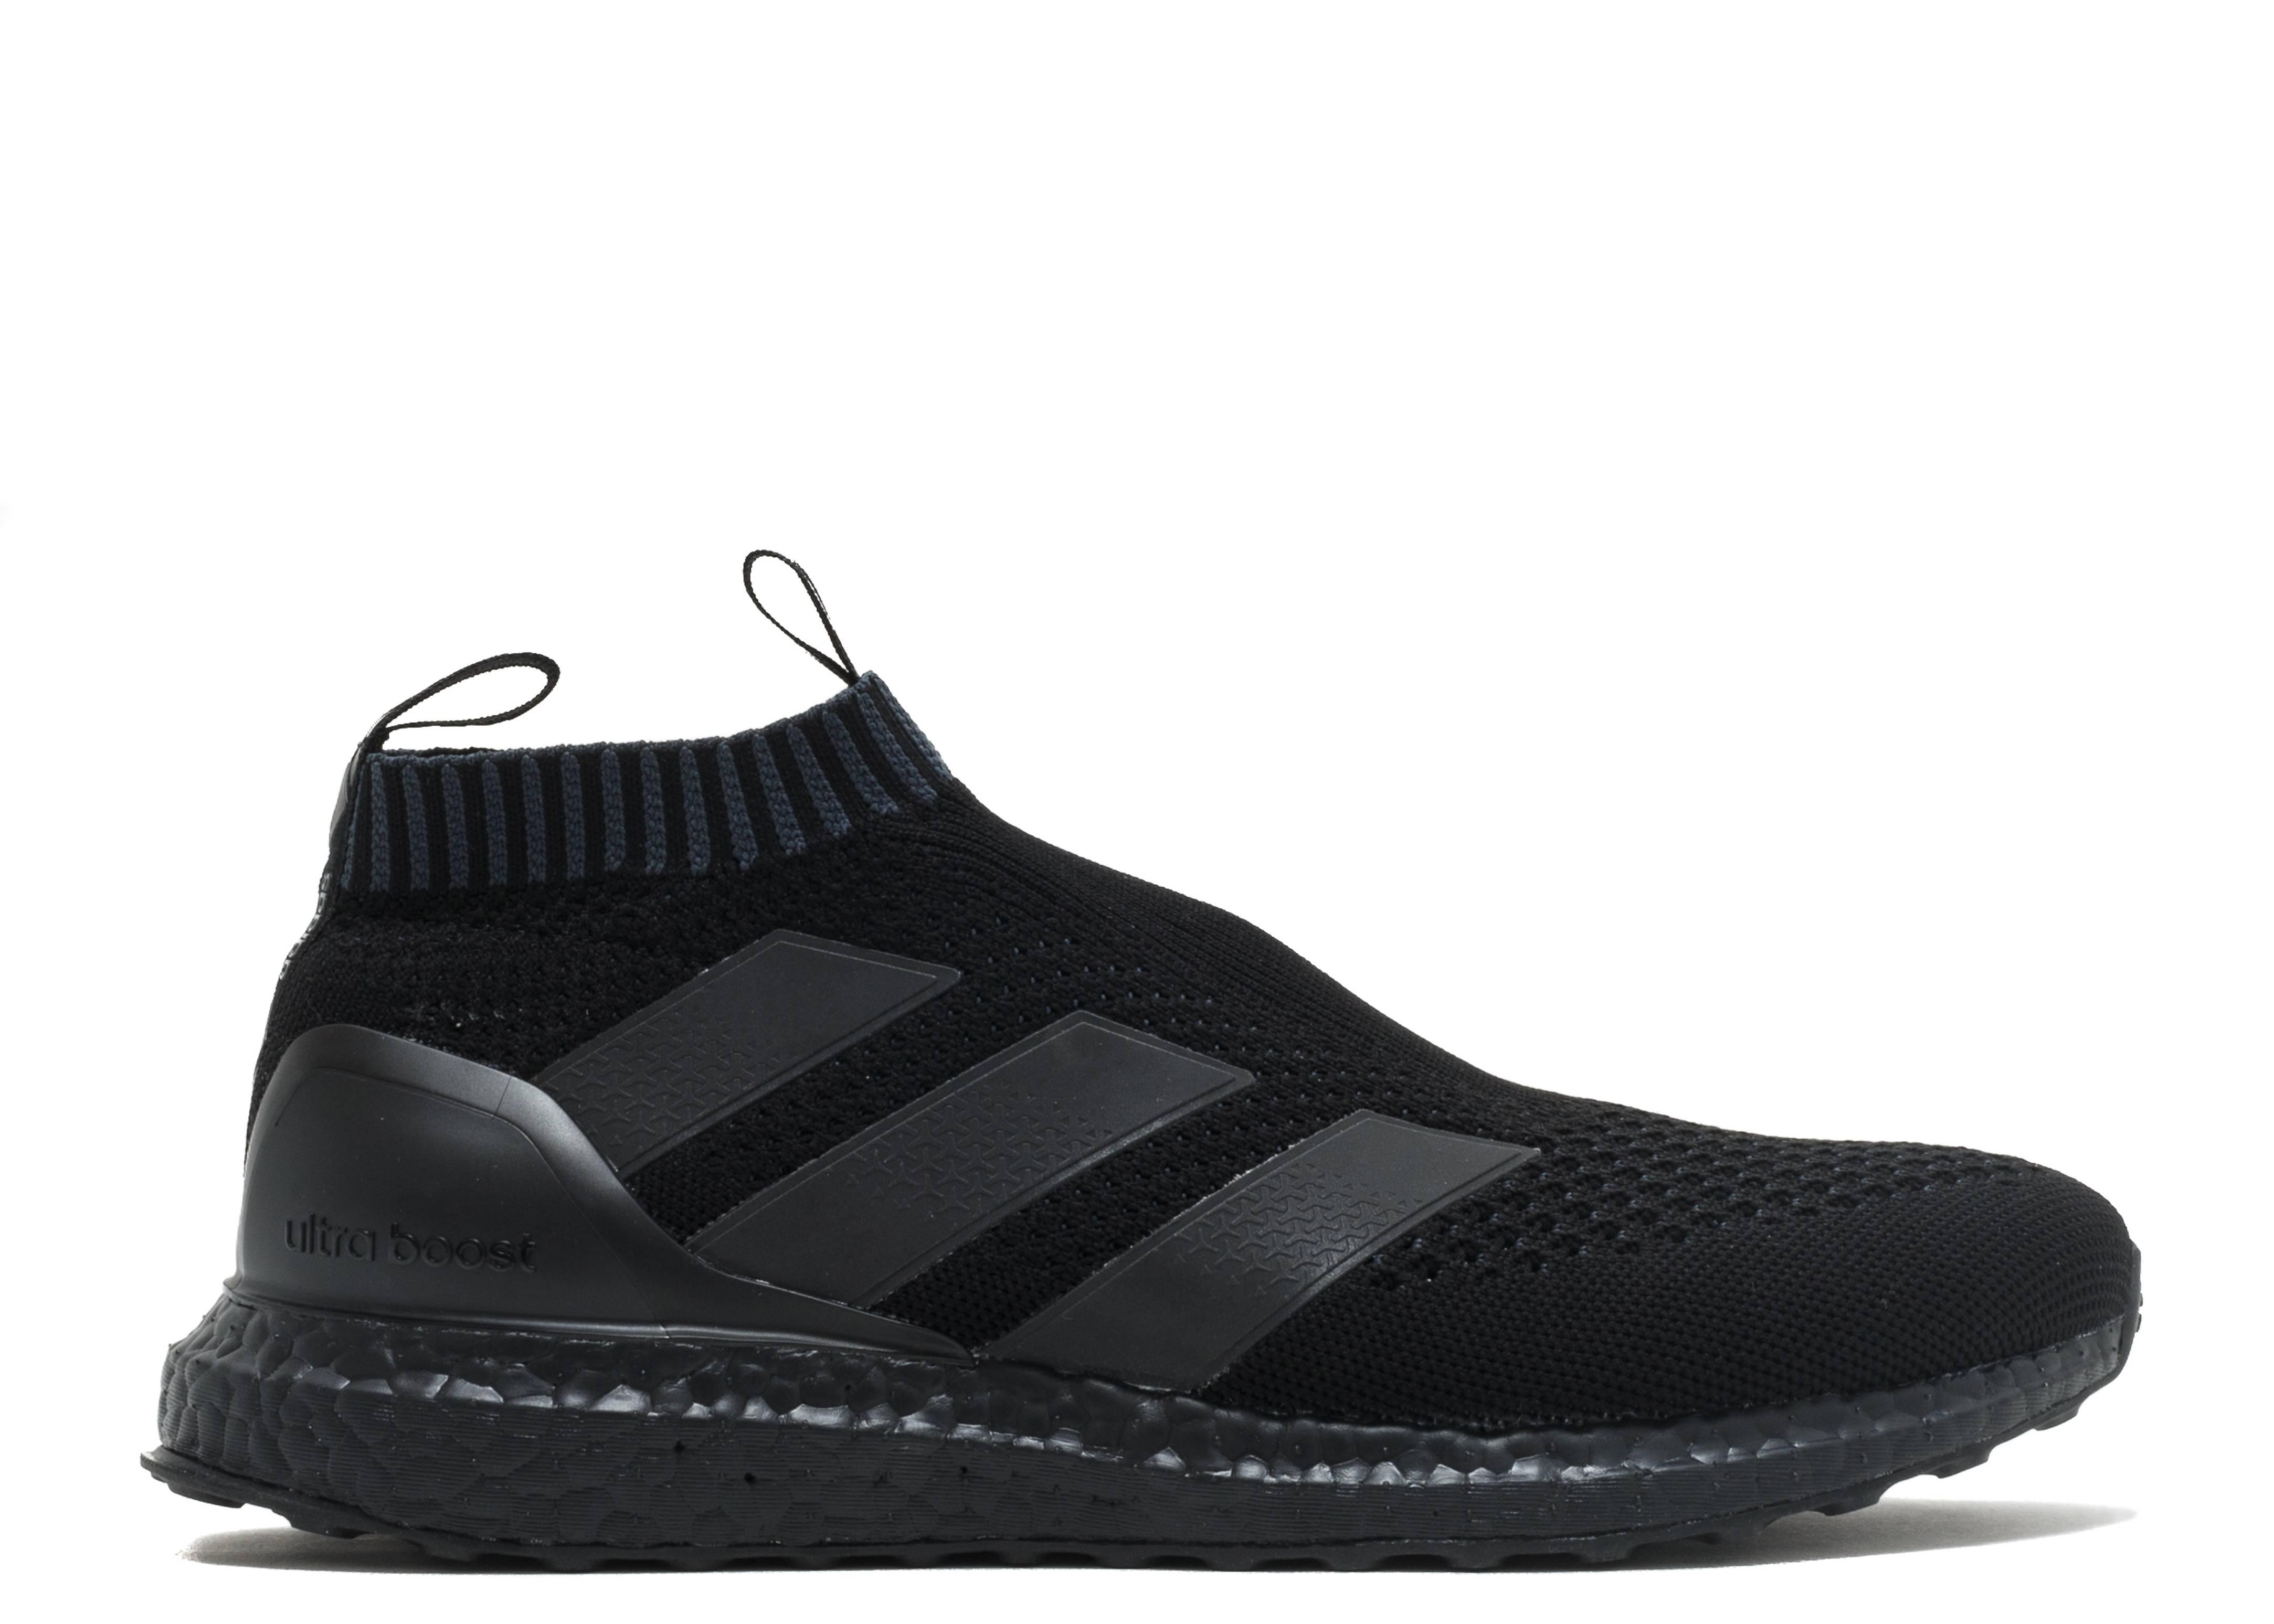 ayer a pesar de plan de estudios  Ace 16+ Pure Control UltraBoost 'Triple Black' - Adidas - BY9088 - core  black/core black/core black | Flight Club